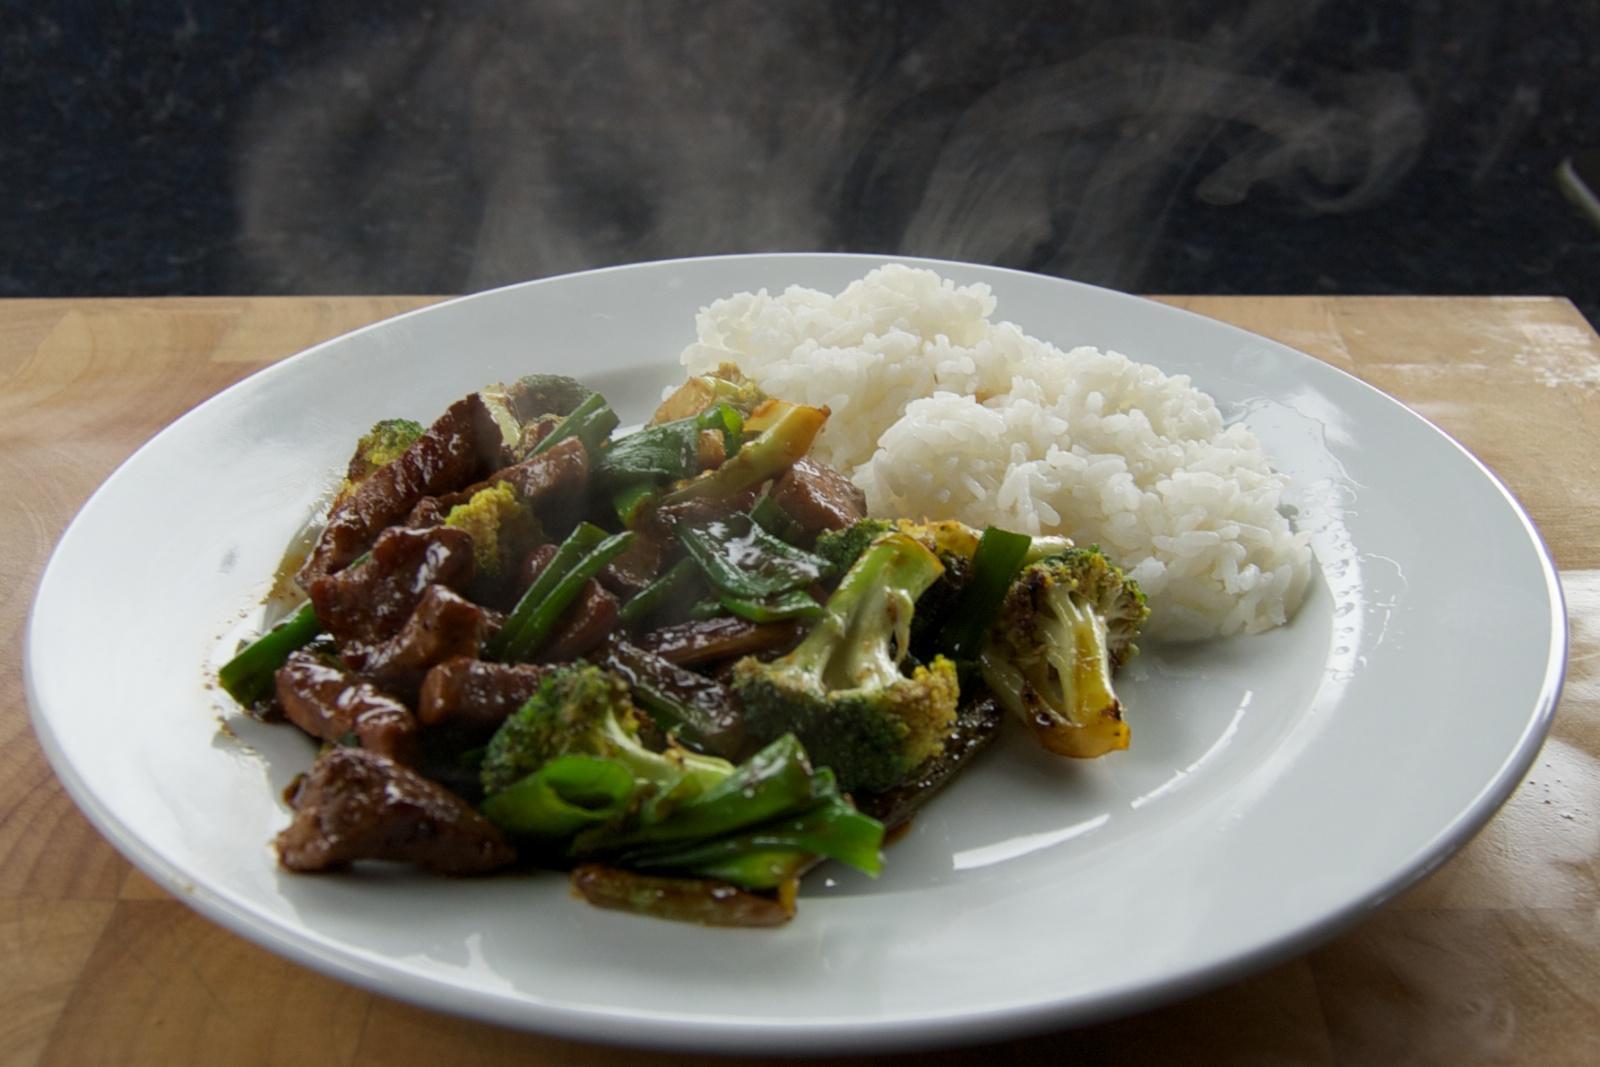 http://blog.rickk.com/food/2012/03/25/ate.2012.03.25.l.jpg